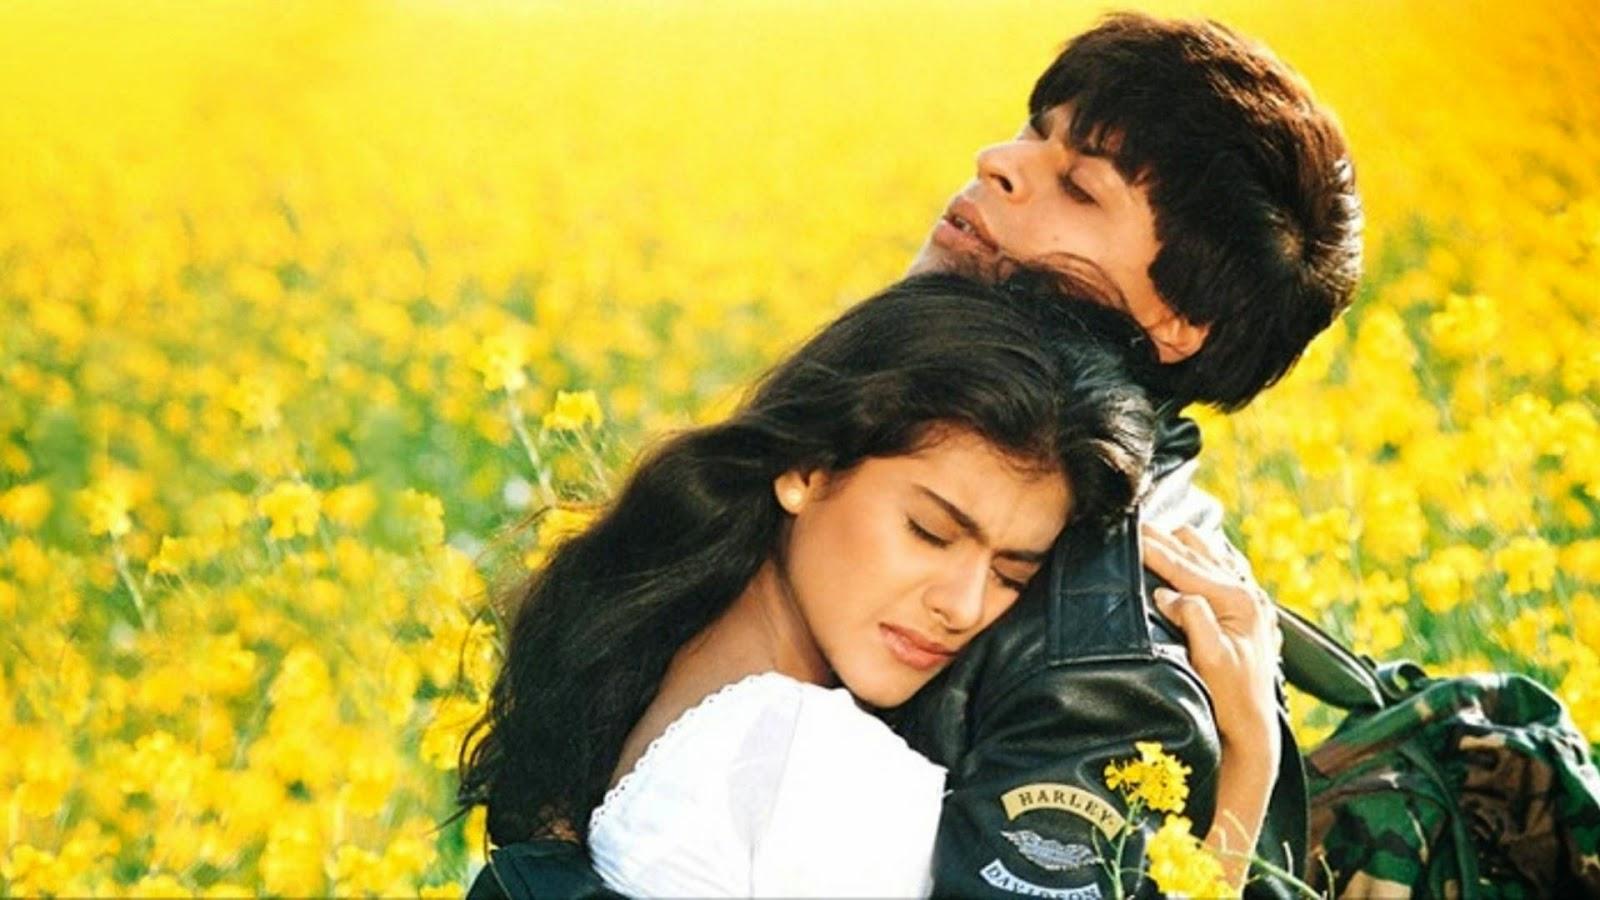 Shahrukh Khan Wallpapers Hd Download Free 1080p: Shahrukh Khan & Kajol HD Wallpapers Free Download